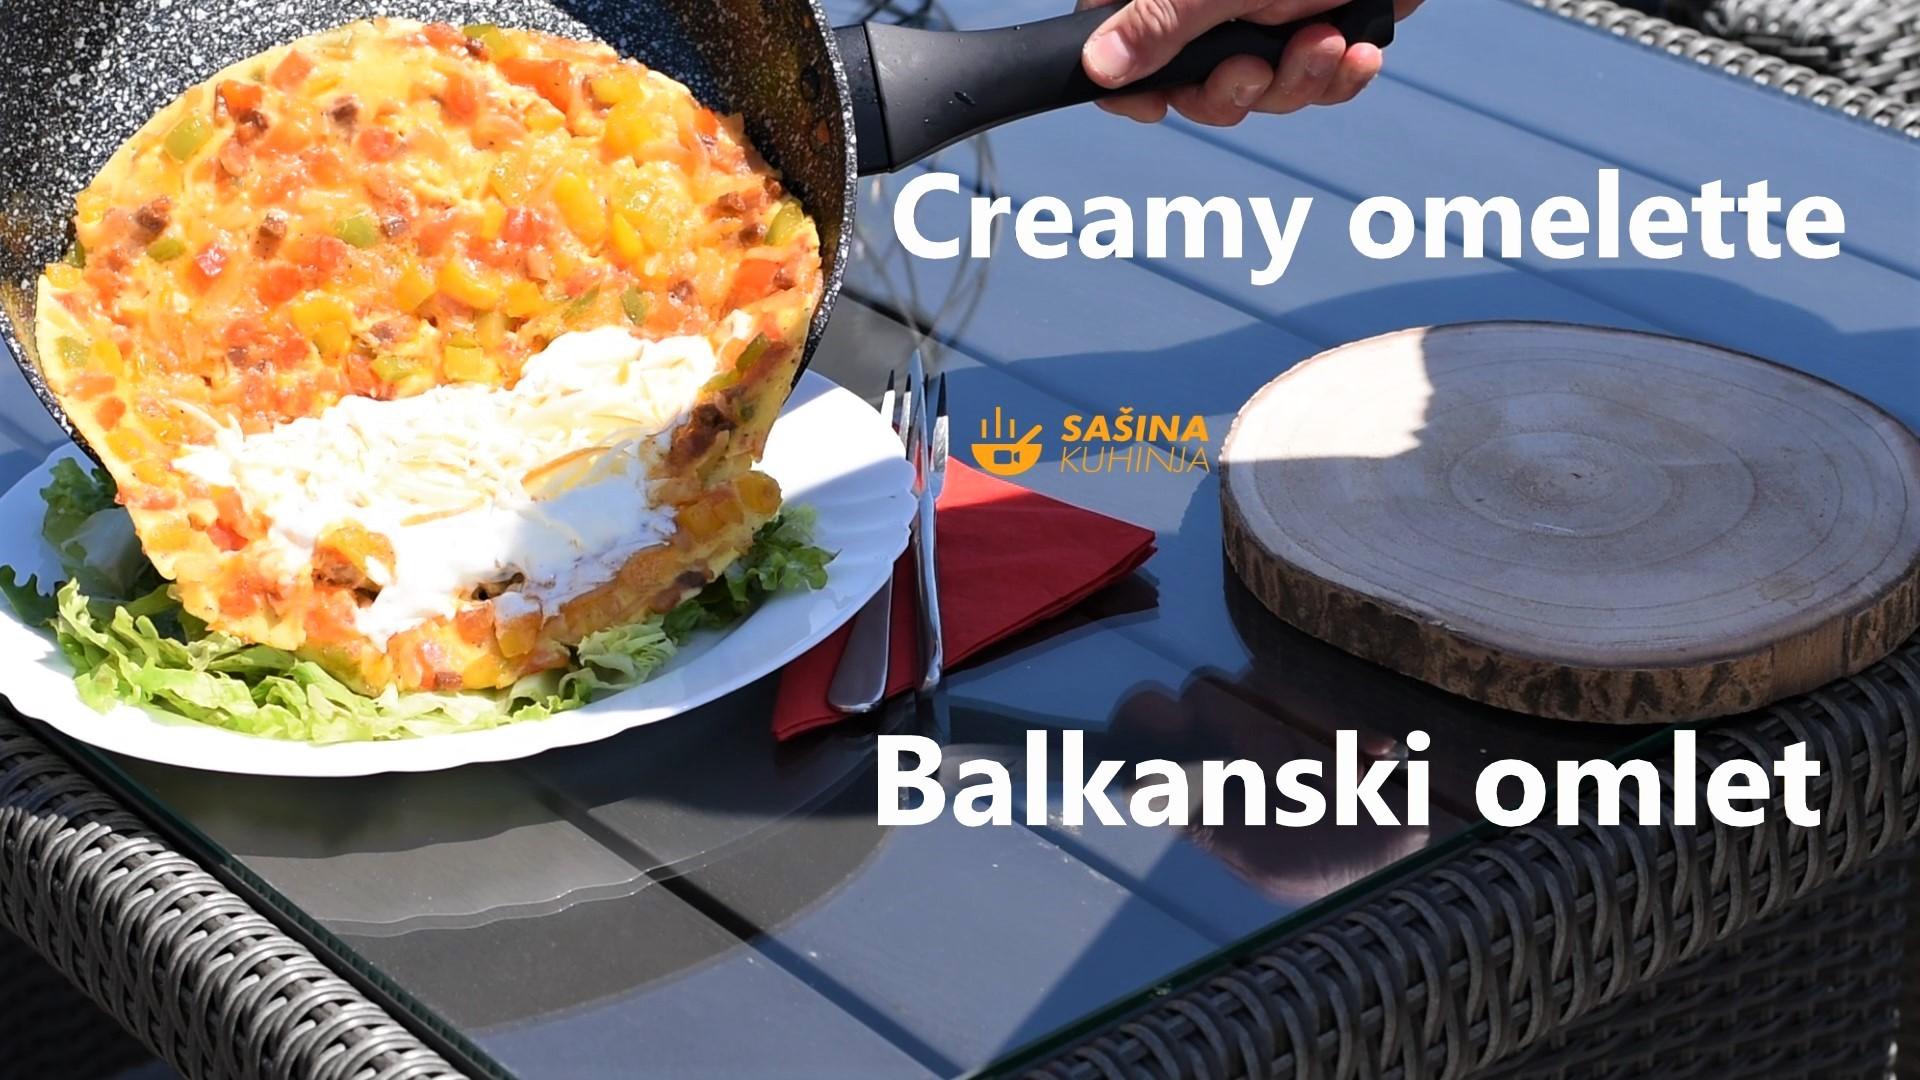 balkanski omlet sašina kuhinja